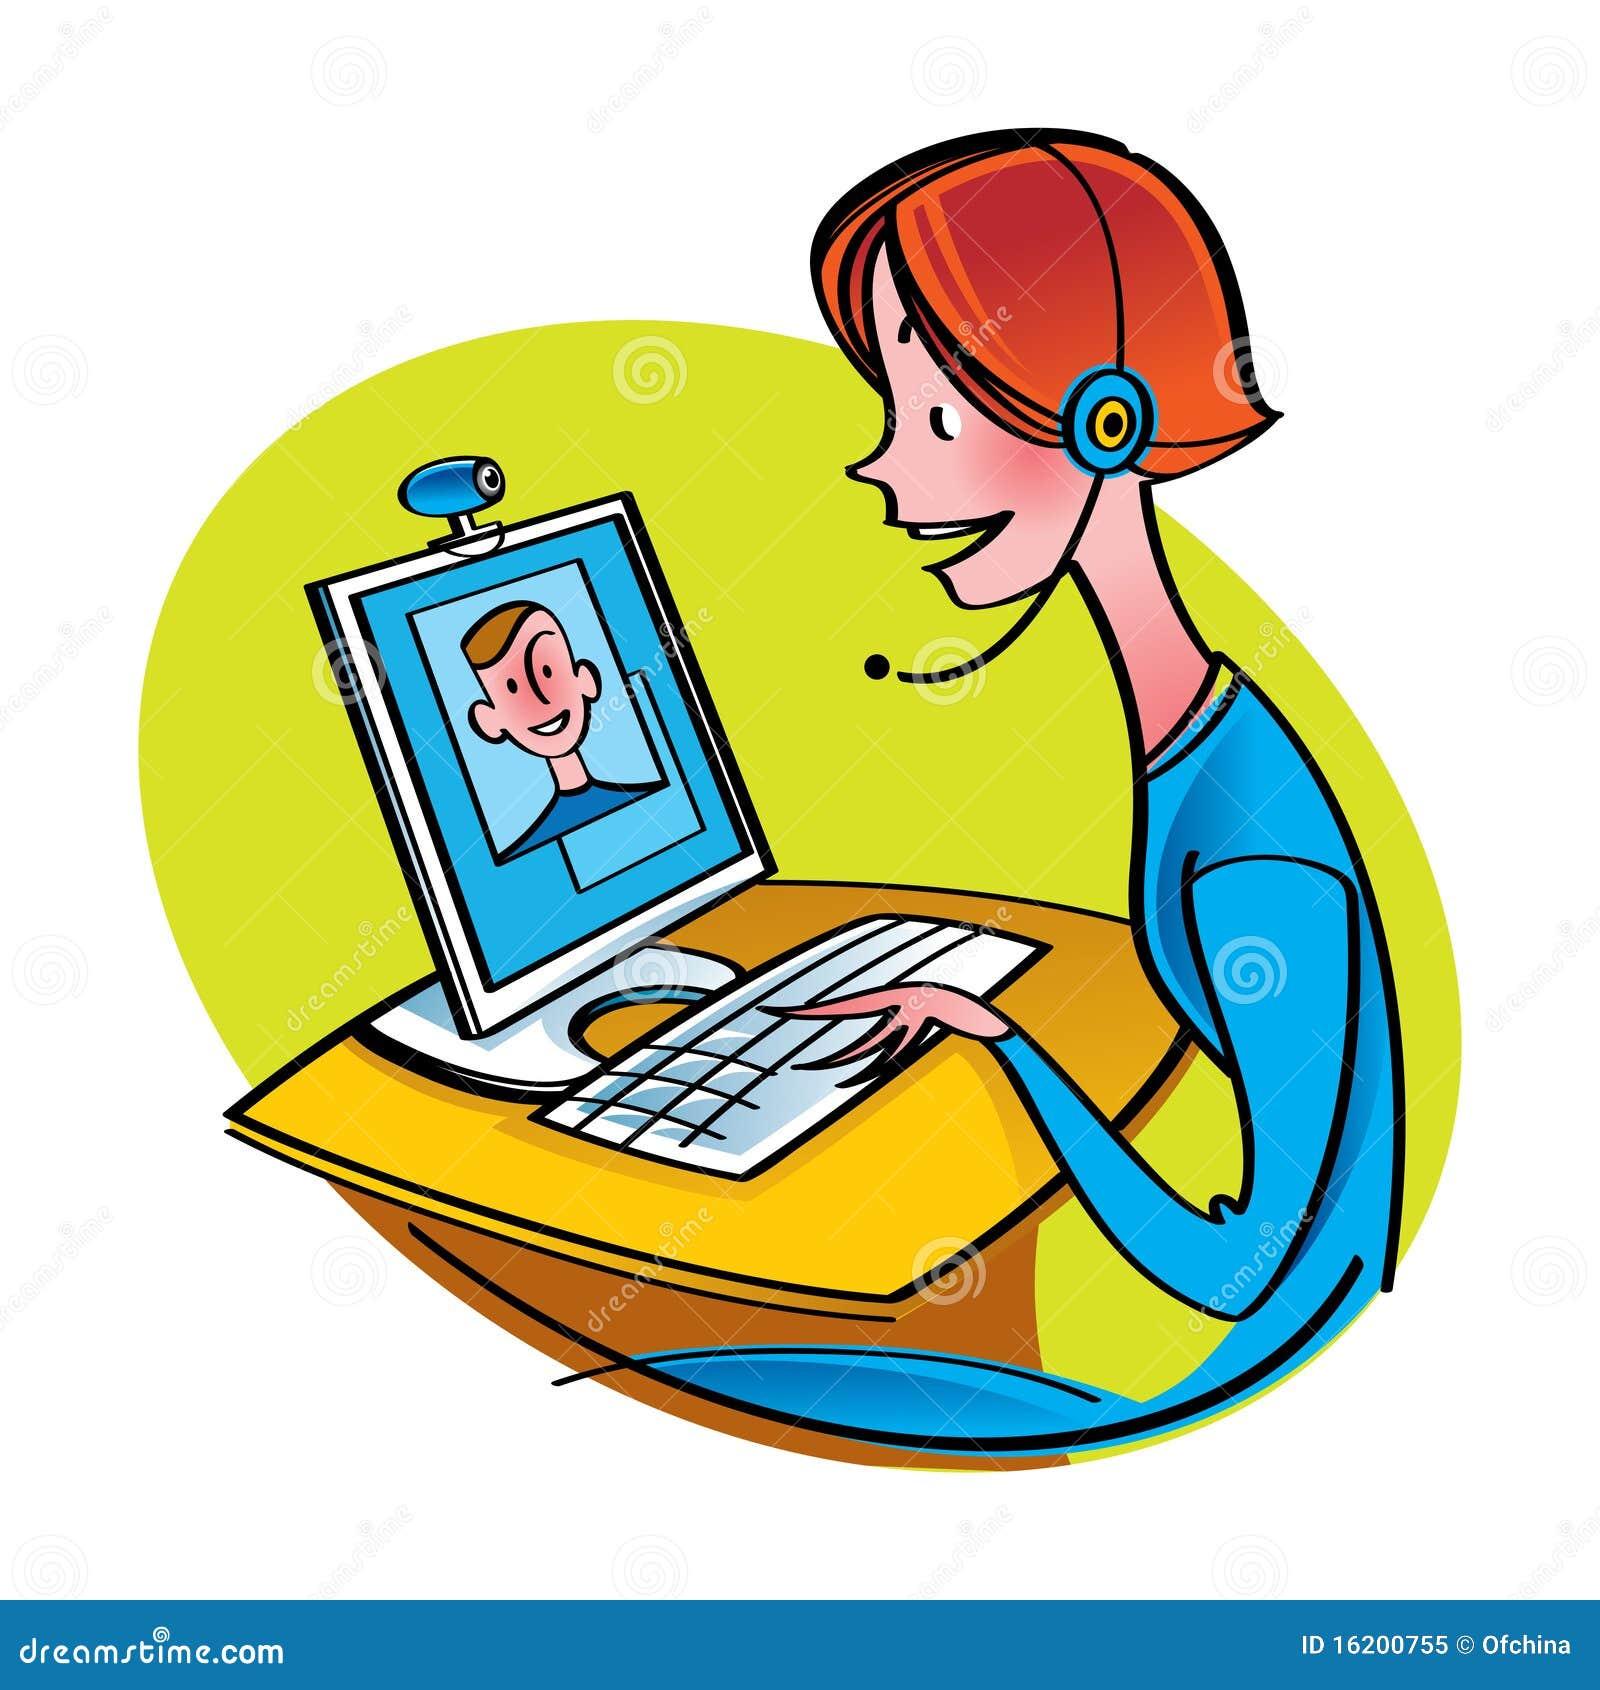 Chatting Illustrations & Vectors